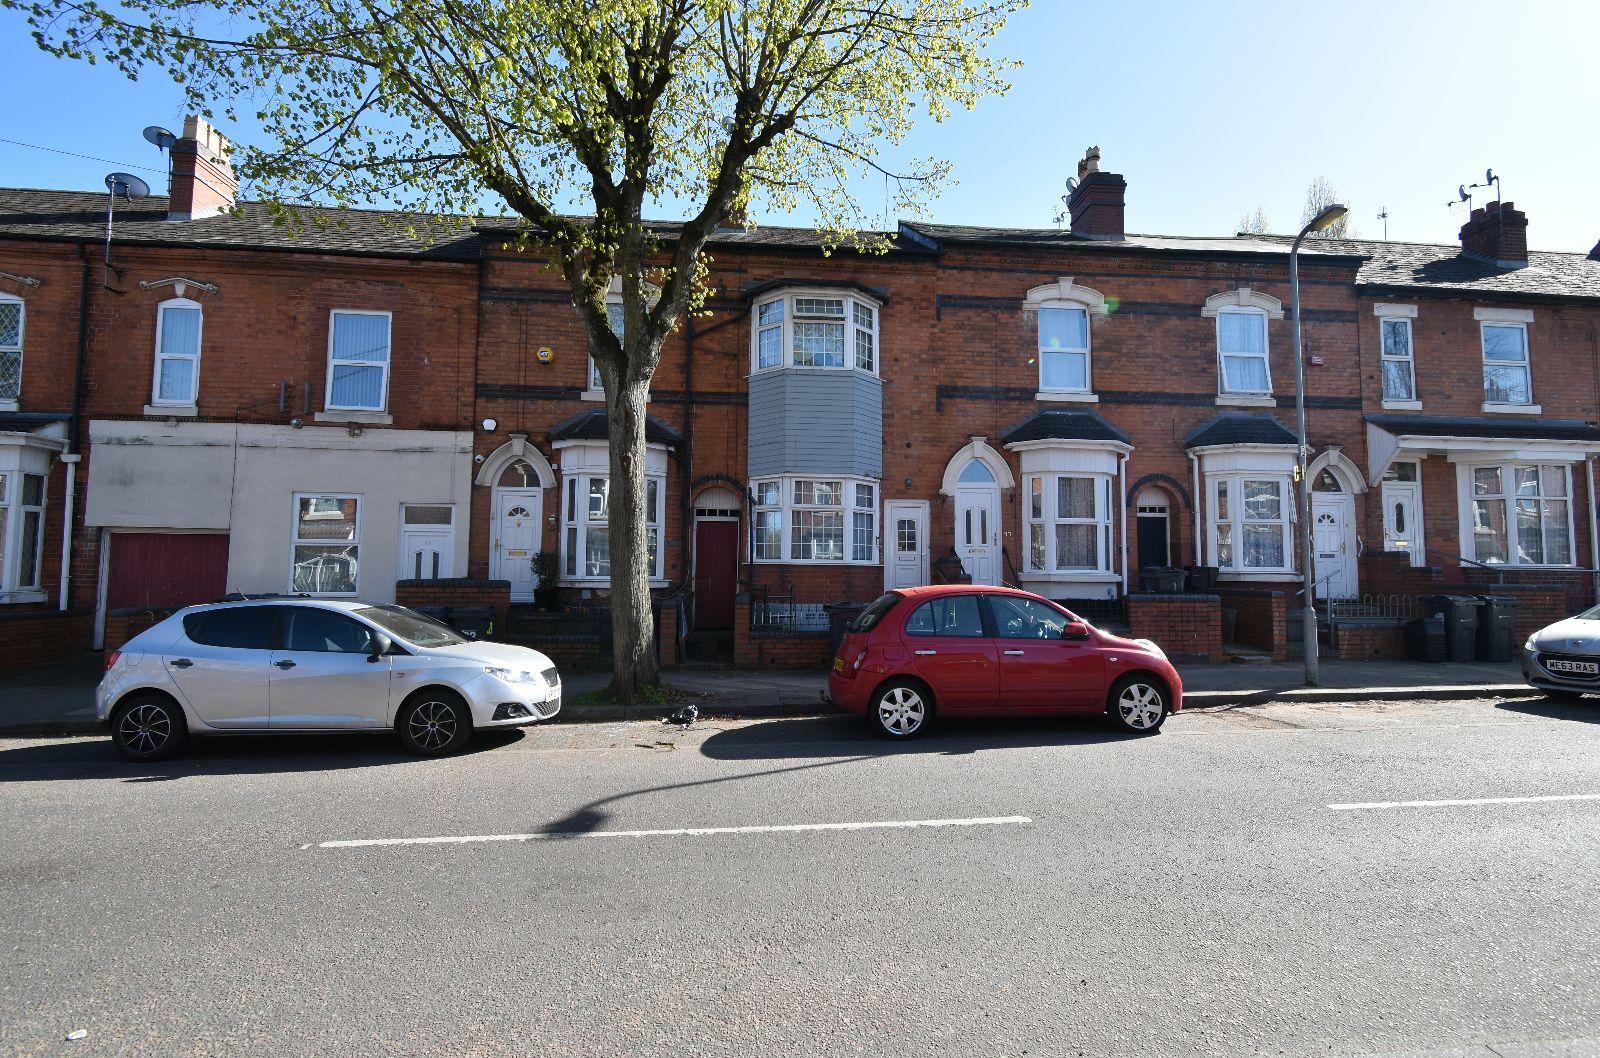 Albert Road, Handsworth, Birmingham, B21 9LB